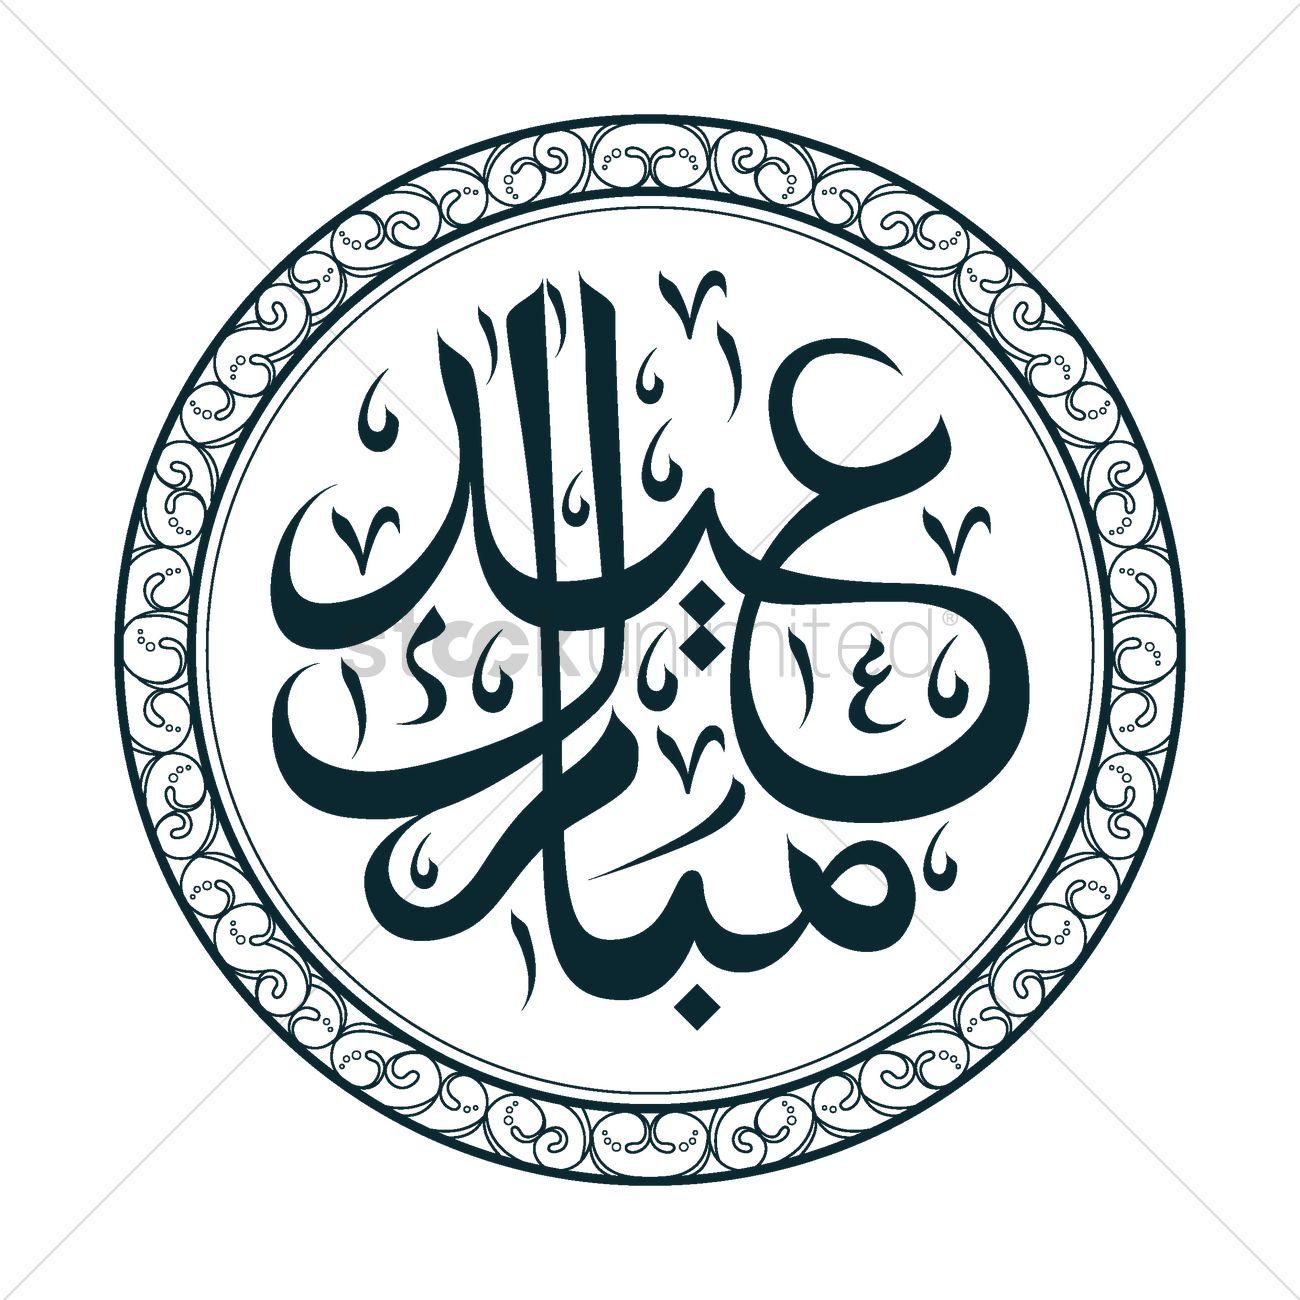 Eid Mubarak Greetings Vector Image 1827502 Stockunlimited